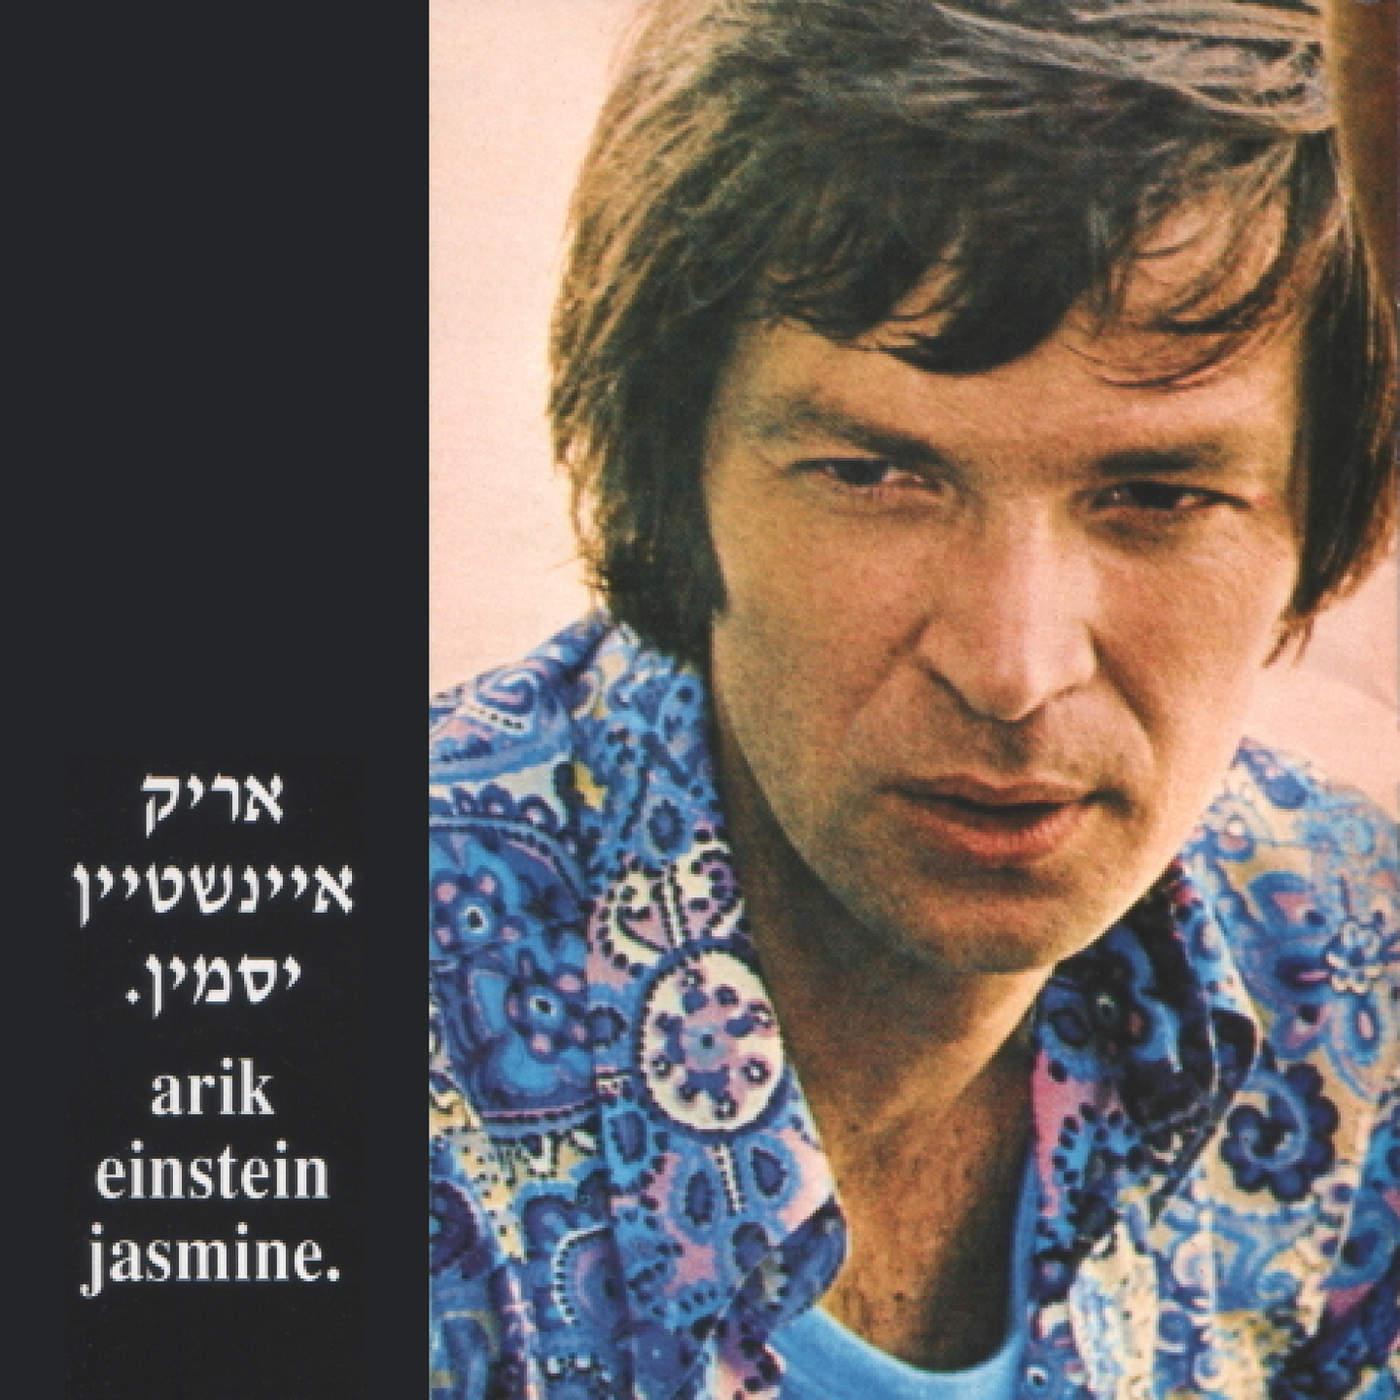 Reason To Believe (Tim Hardin Cover)